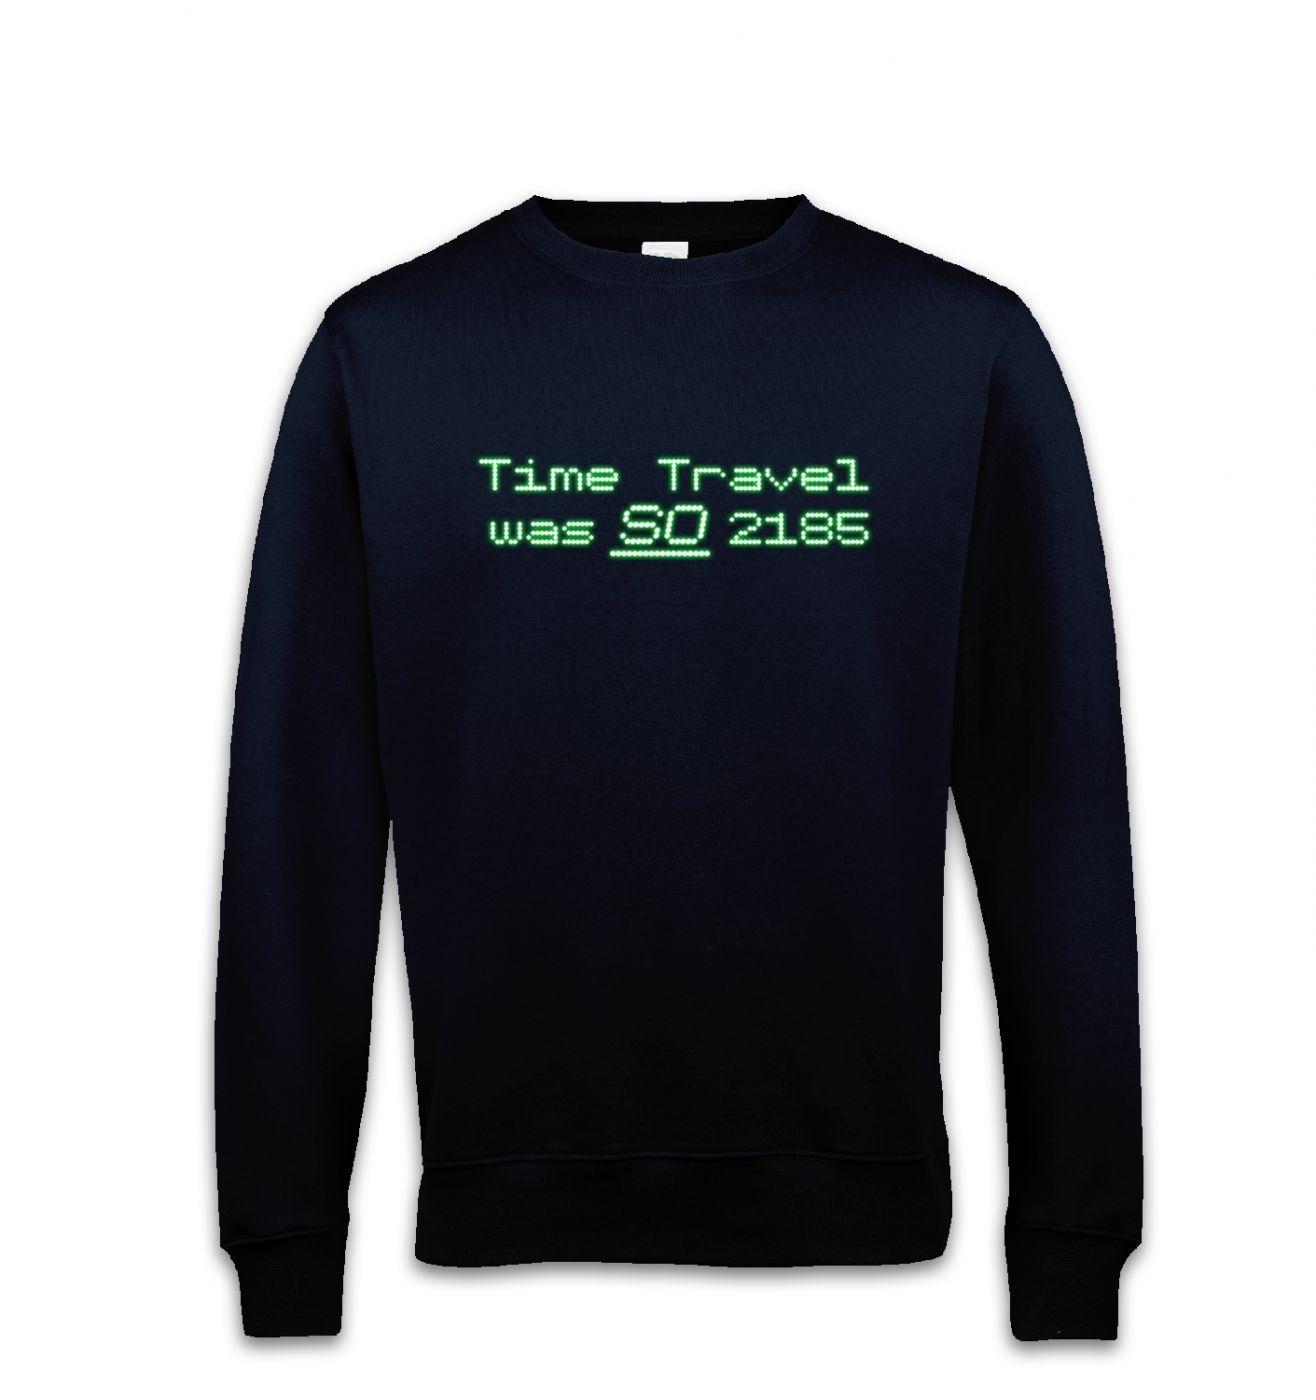 Time Travel Was So 2185 sweatshirt